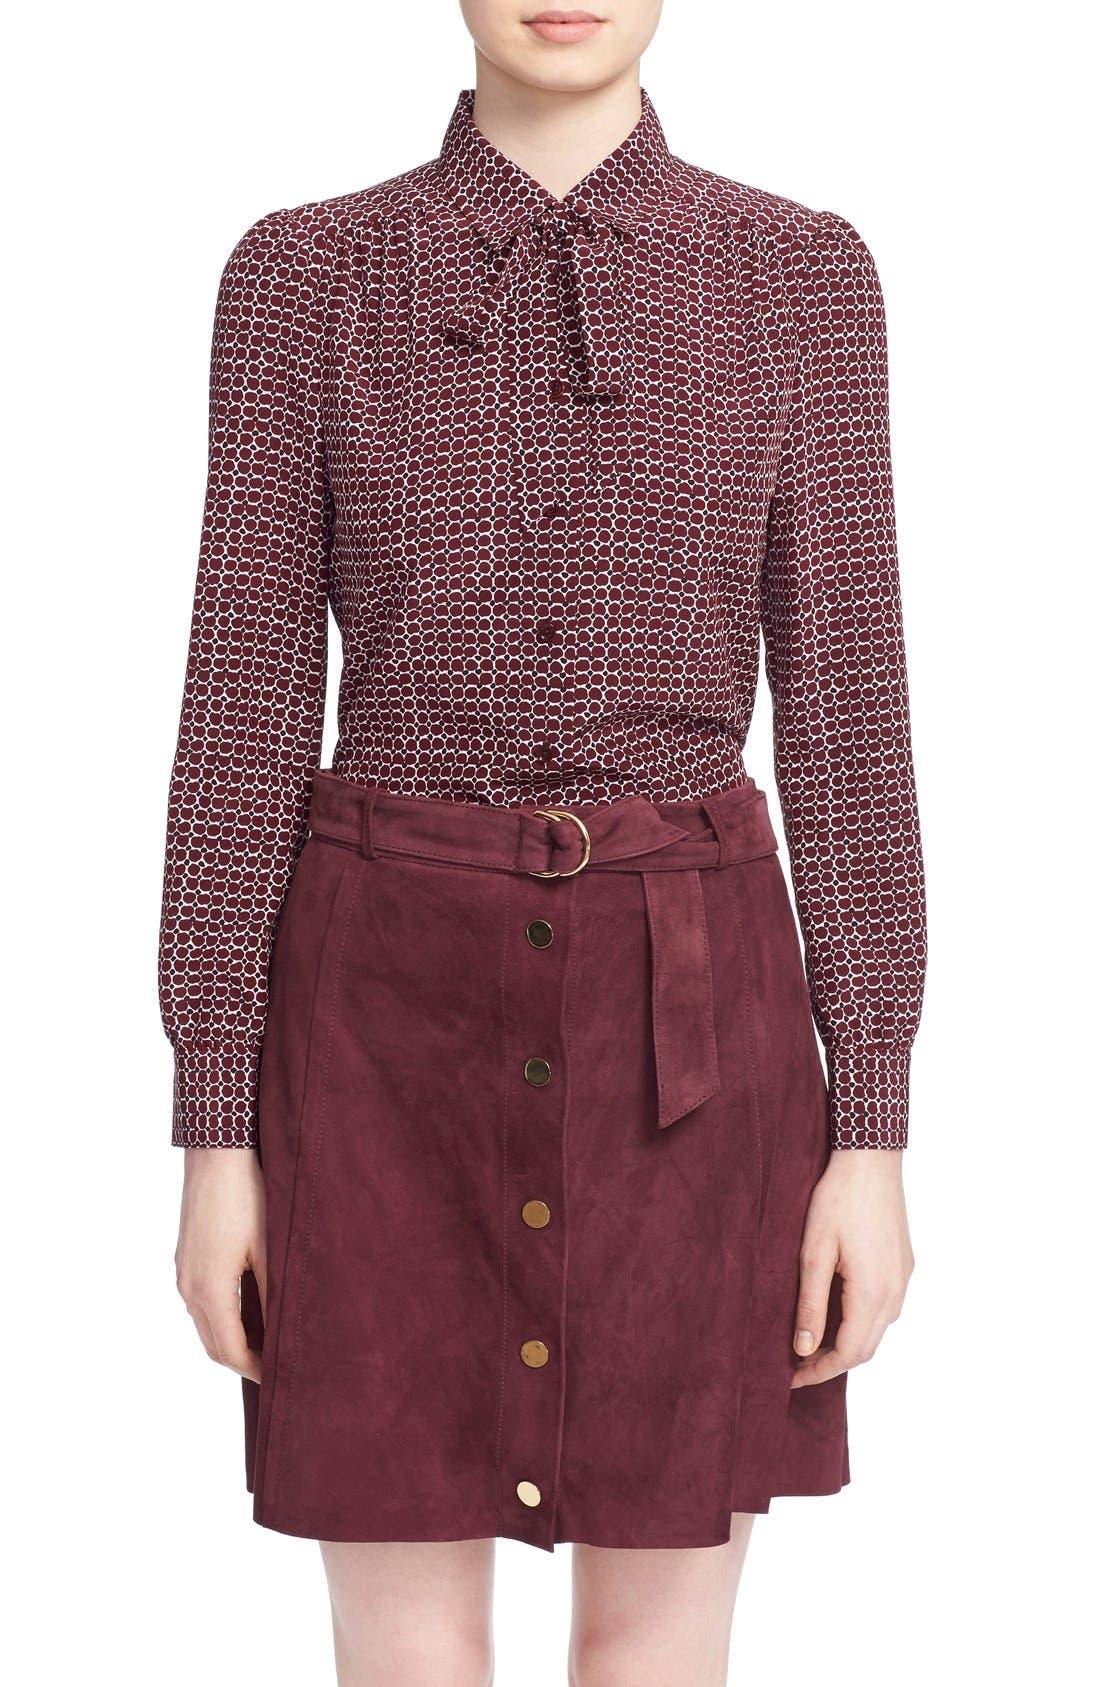 Alternate Image 1 Selected - kate spade new york 'parker dot' print silk bow blouse